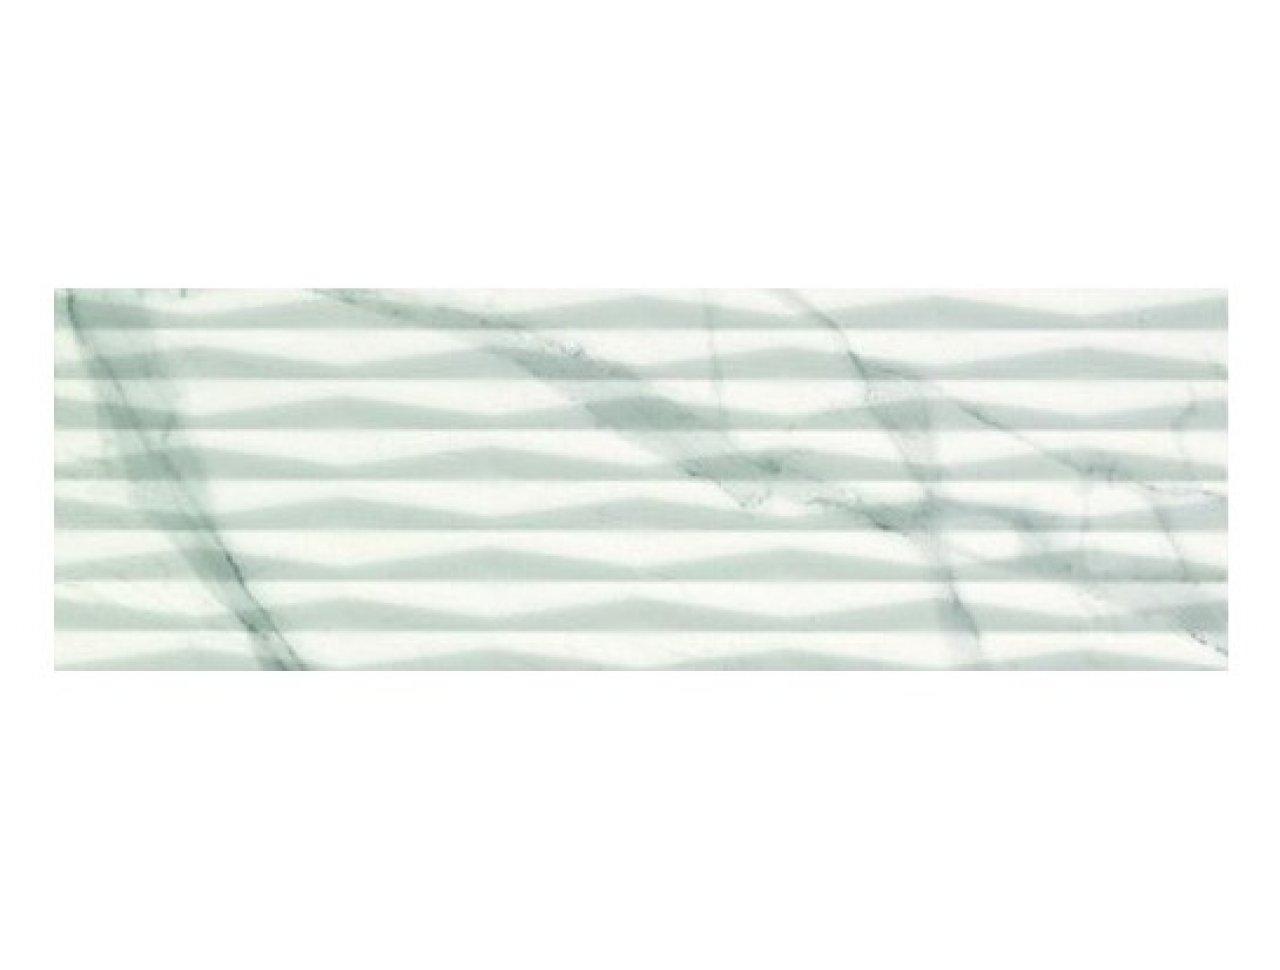 Настенный декор FAP Roma Fold Statuario 75 x 25 см, Арт. fLSZ